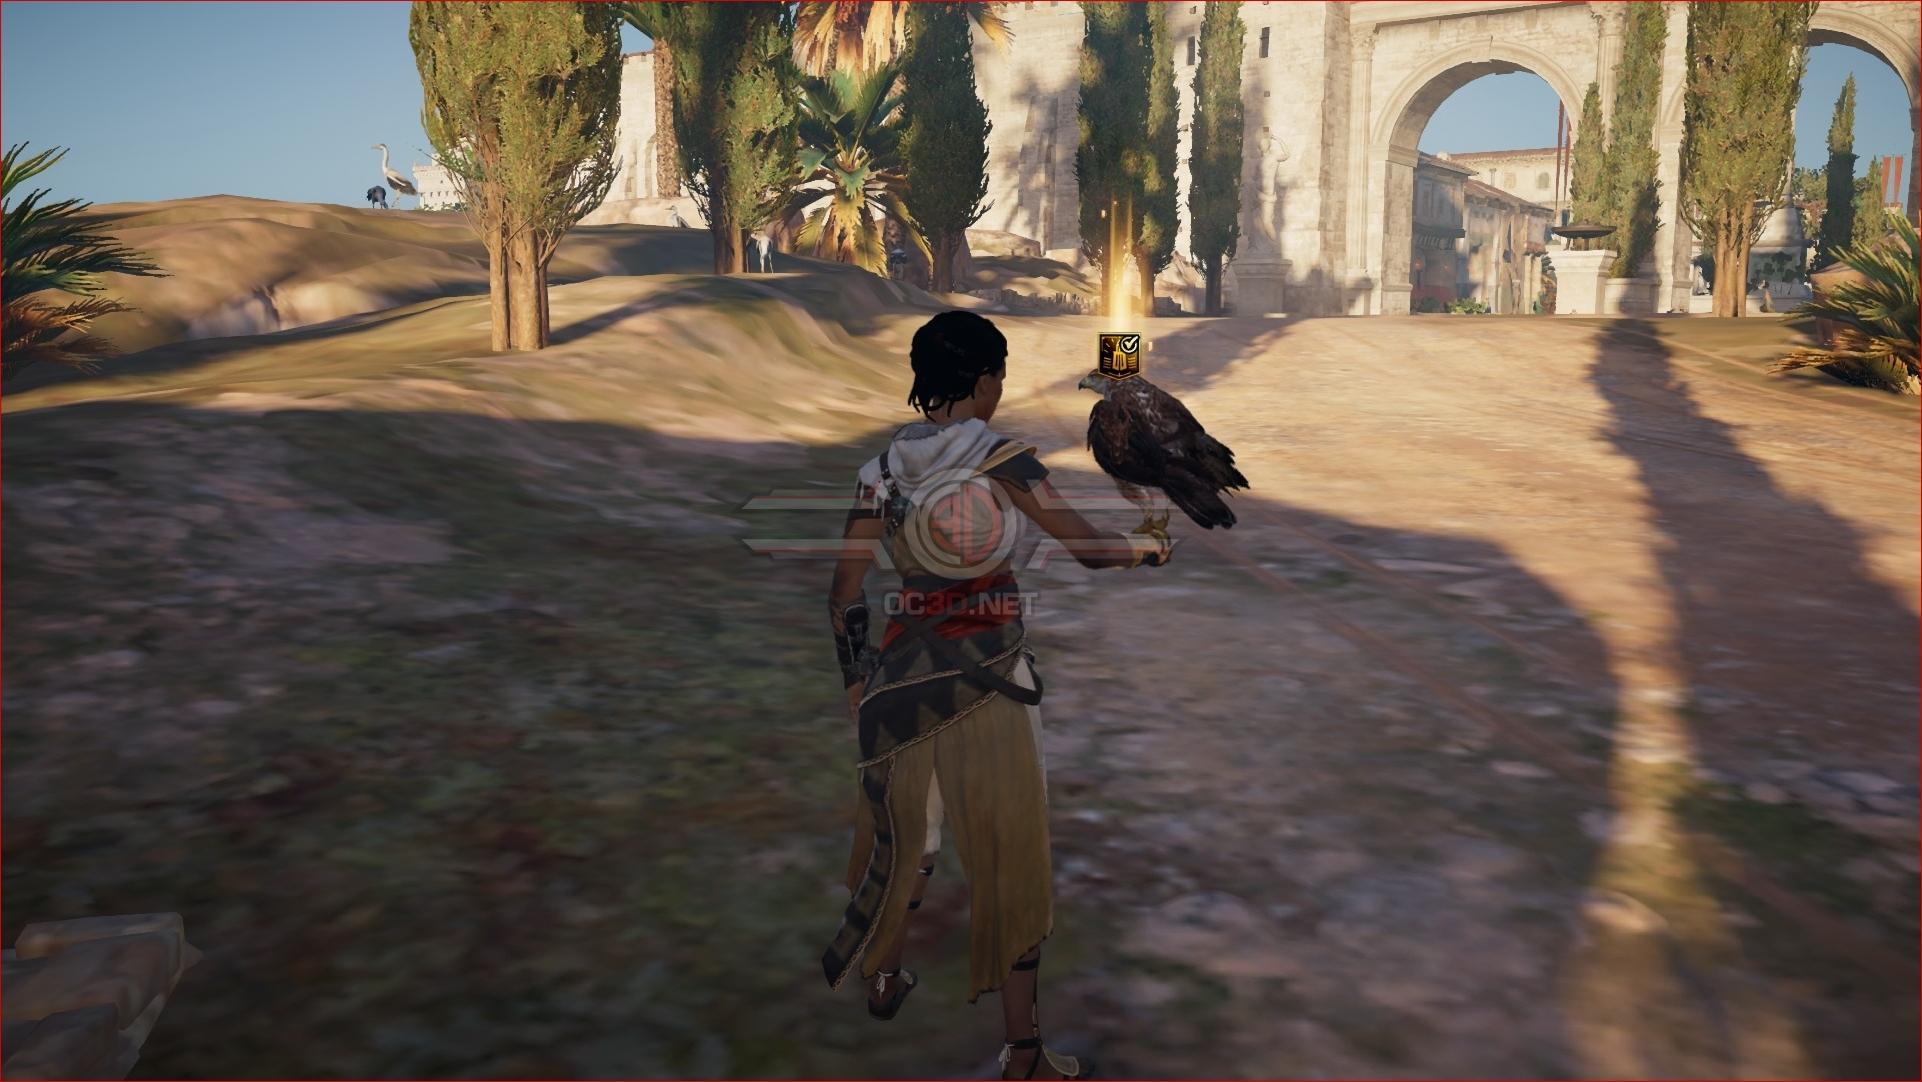 AMD Ryzen/Raven Ridge APU Gaming Review | Assassin's Creed Origins